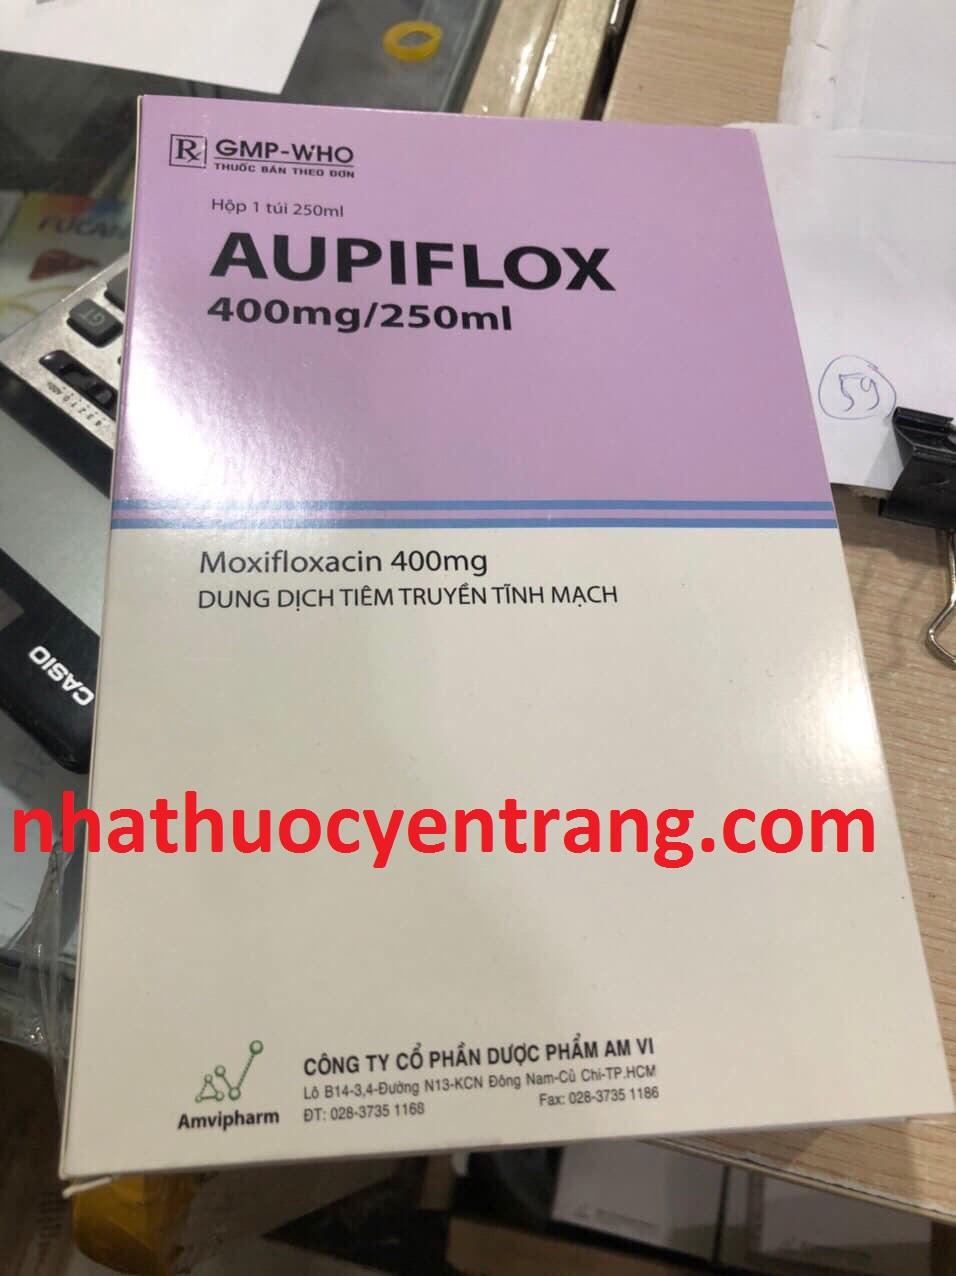 Aupiflox